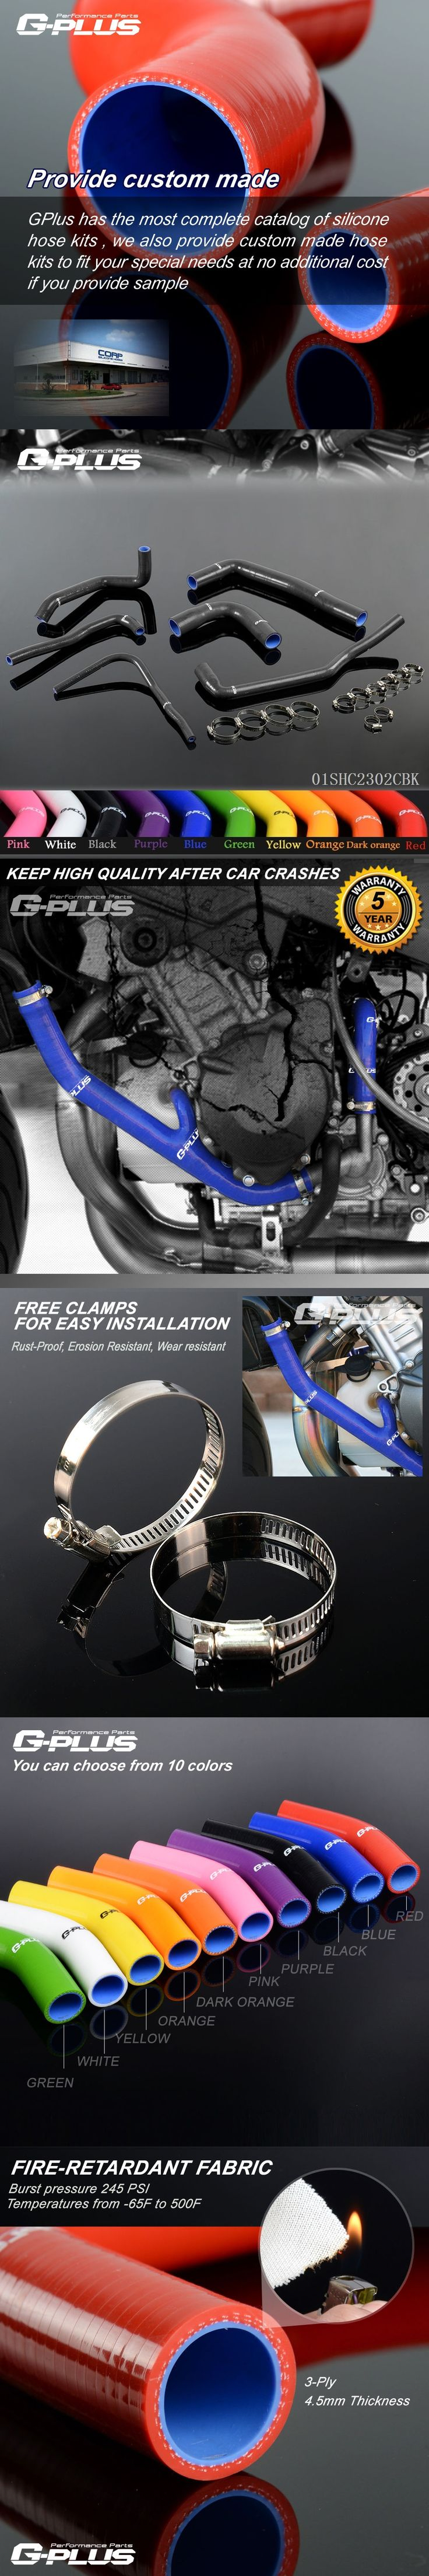 Gplus Silicone Radiator Hose Kit For SAAB 9000 91-98 B204 B234 2.0 2.3 AERO -01SHC2302C